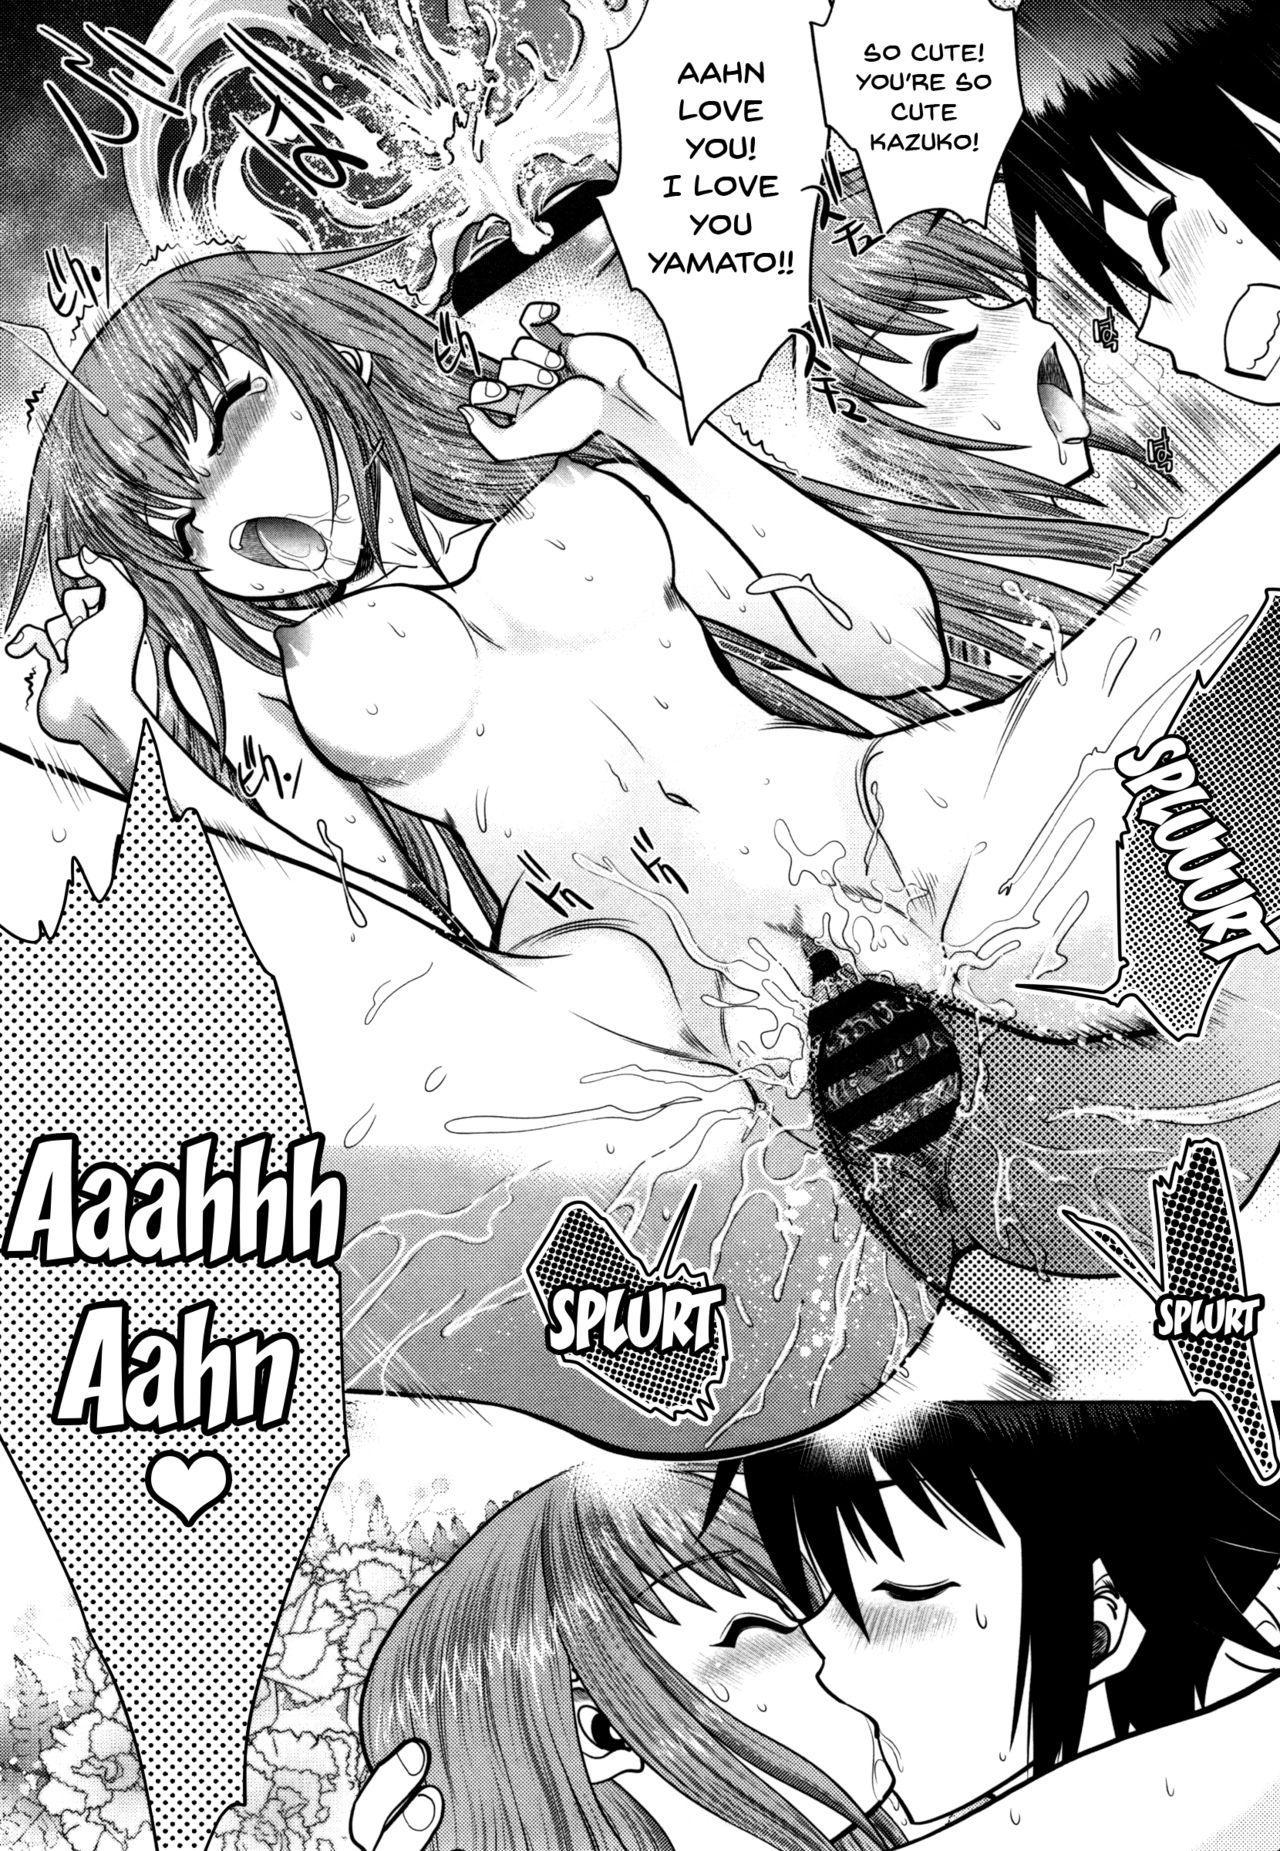 [Yagami Dai] Maji de Watashi ni Koi Shinasai! S Adult Edition ~Shodai Heroine Hen~ | Fall in Love With Me For Real! Ch.1-6 [English] {Doujins.com} 83